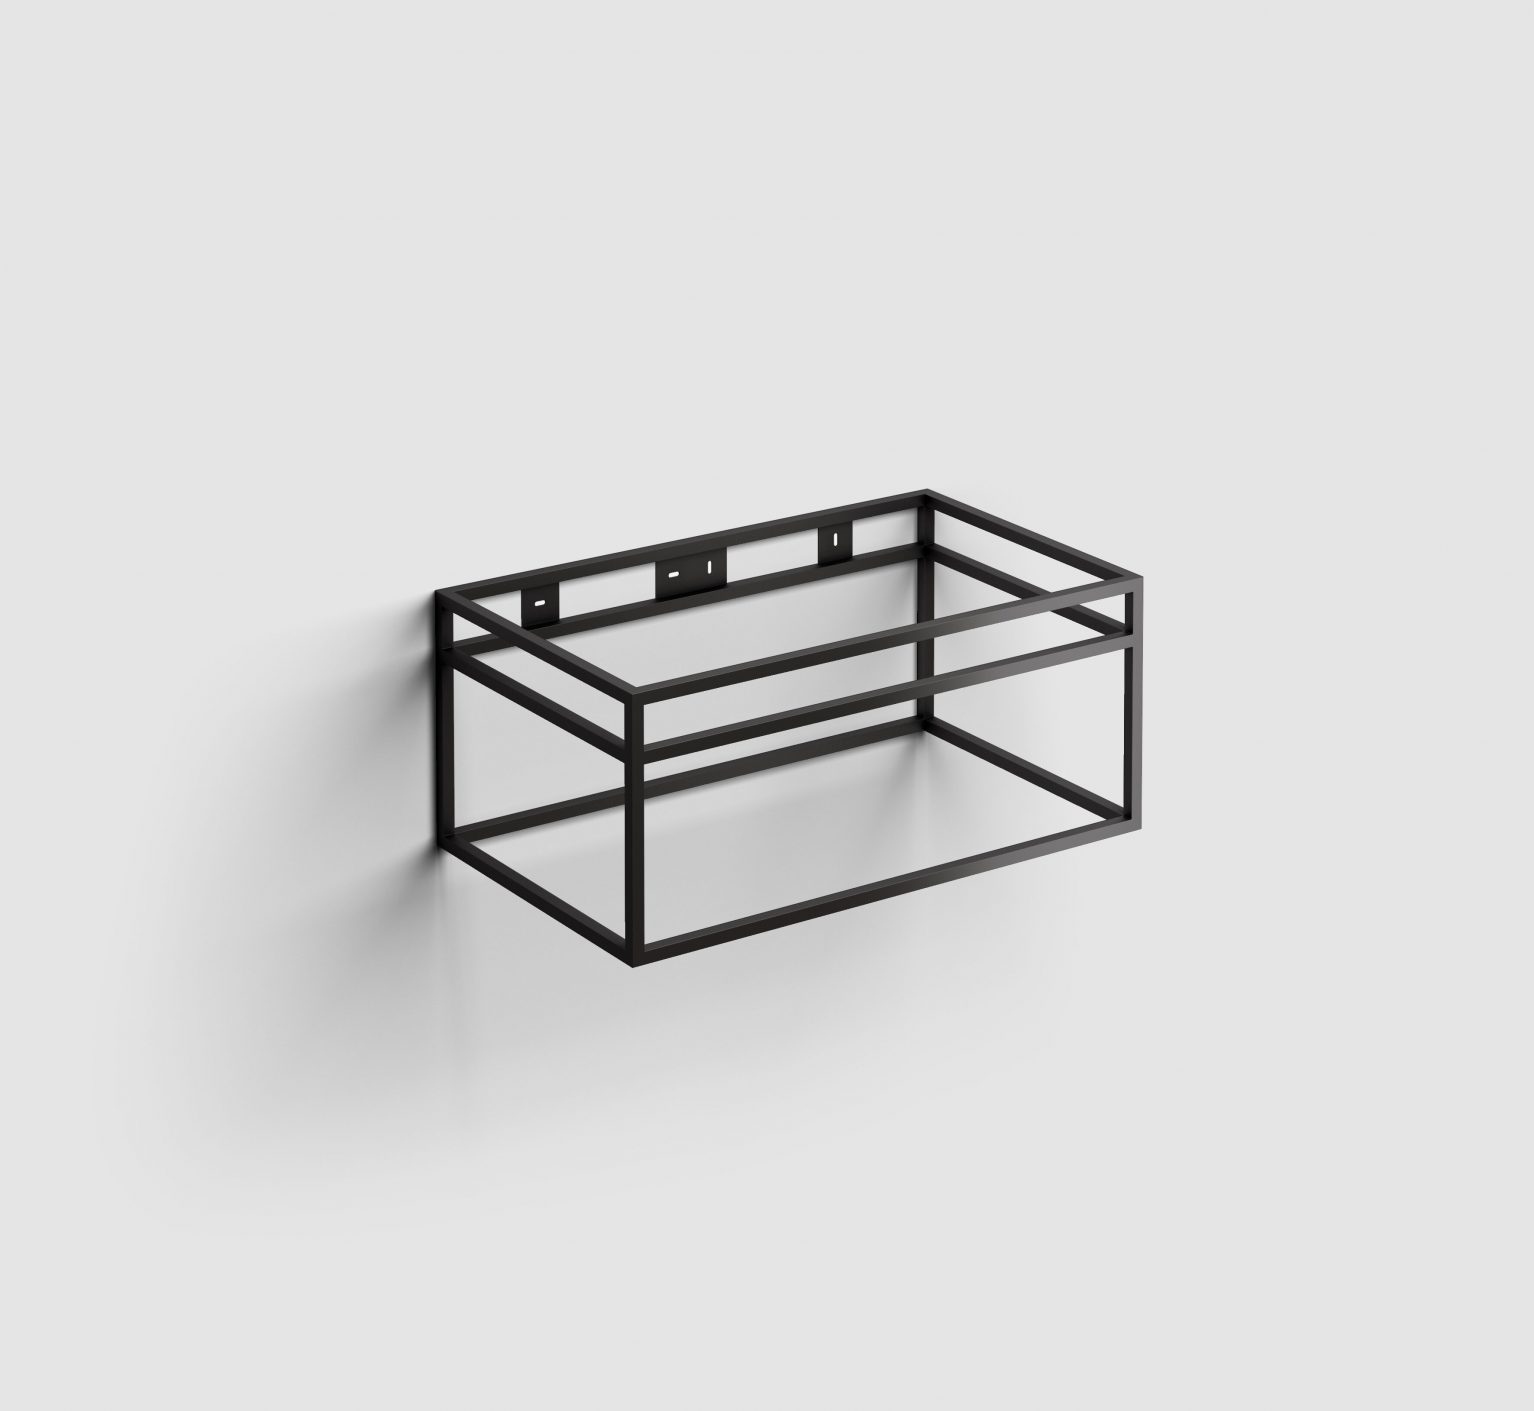 (New) Wash Me Frame rvs kokerprof. 70 cm mat zwart poederlak)